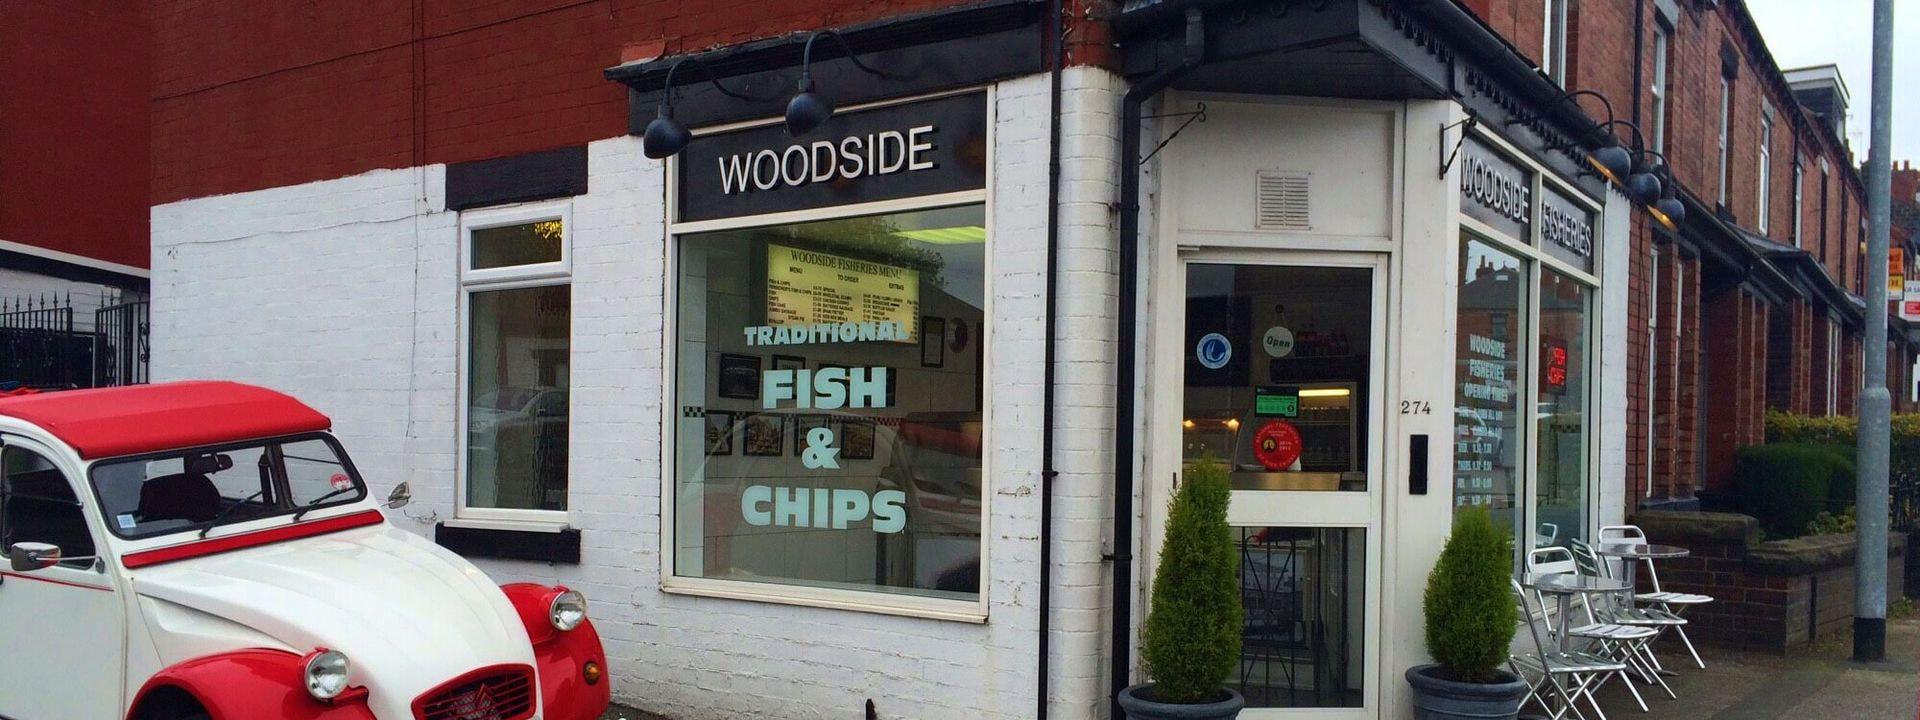 Woodside Fisheries